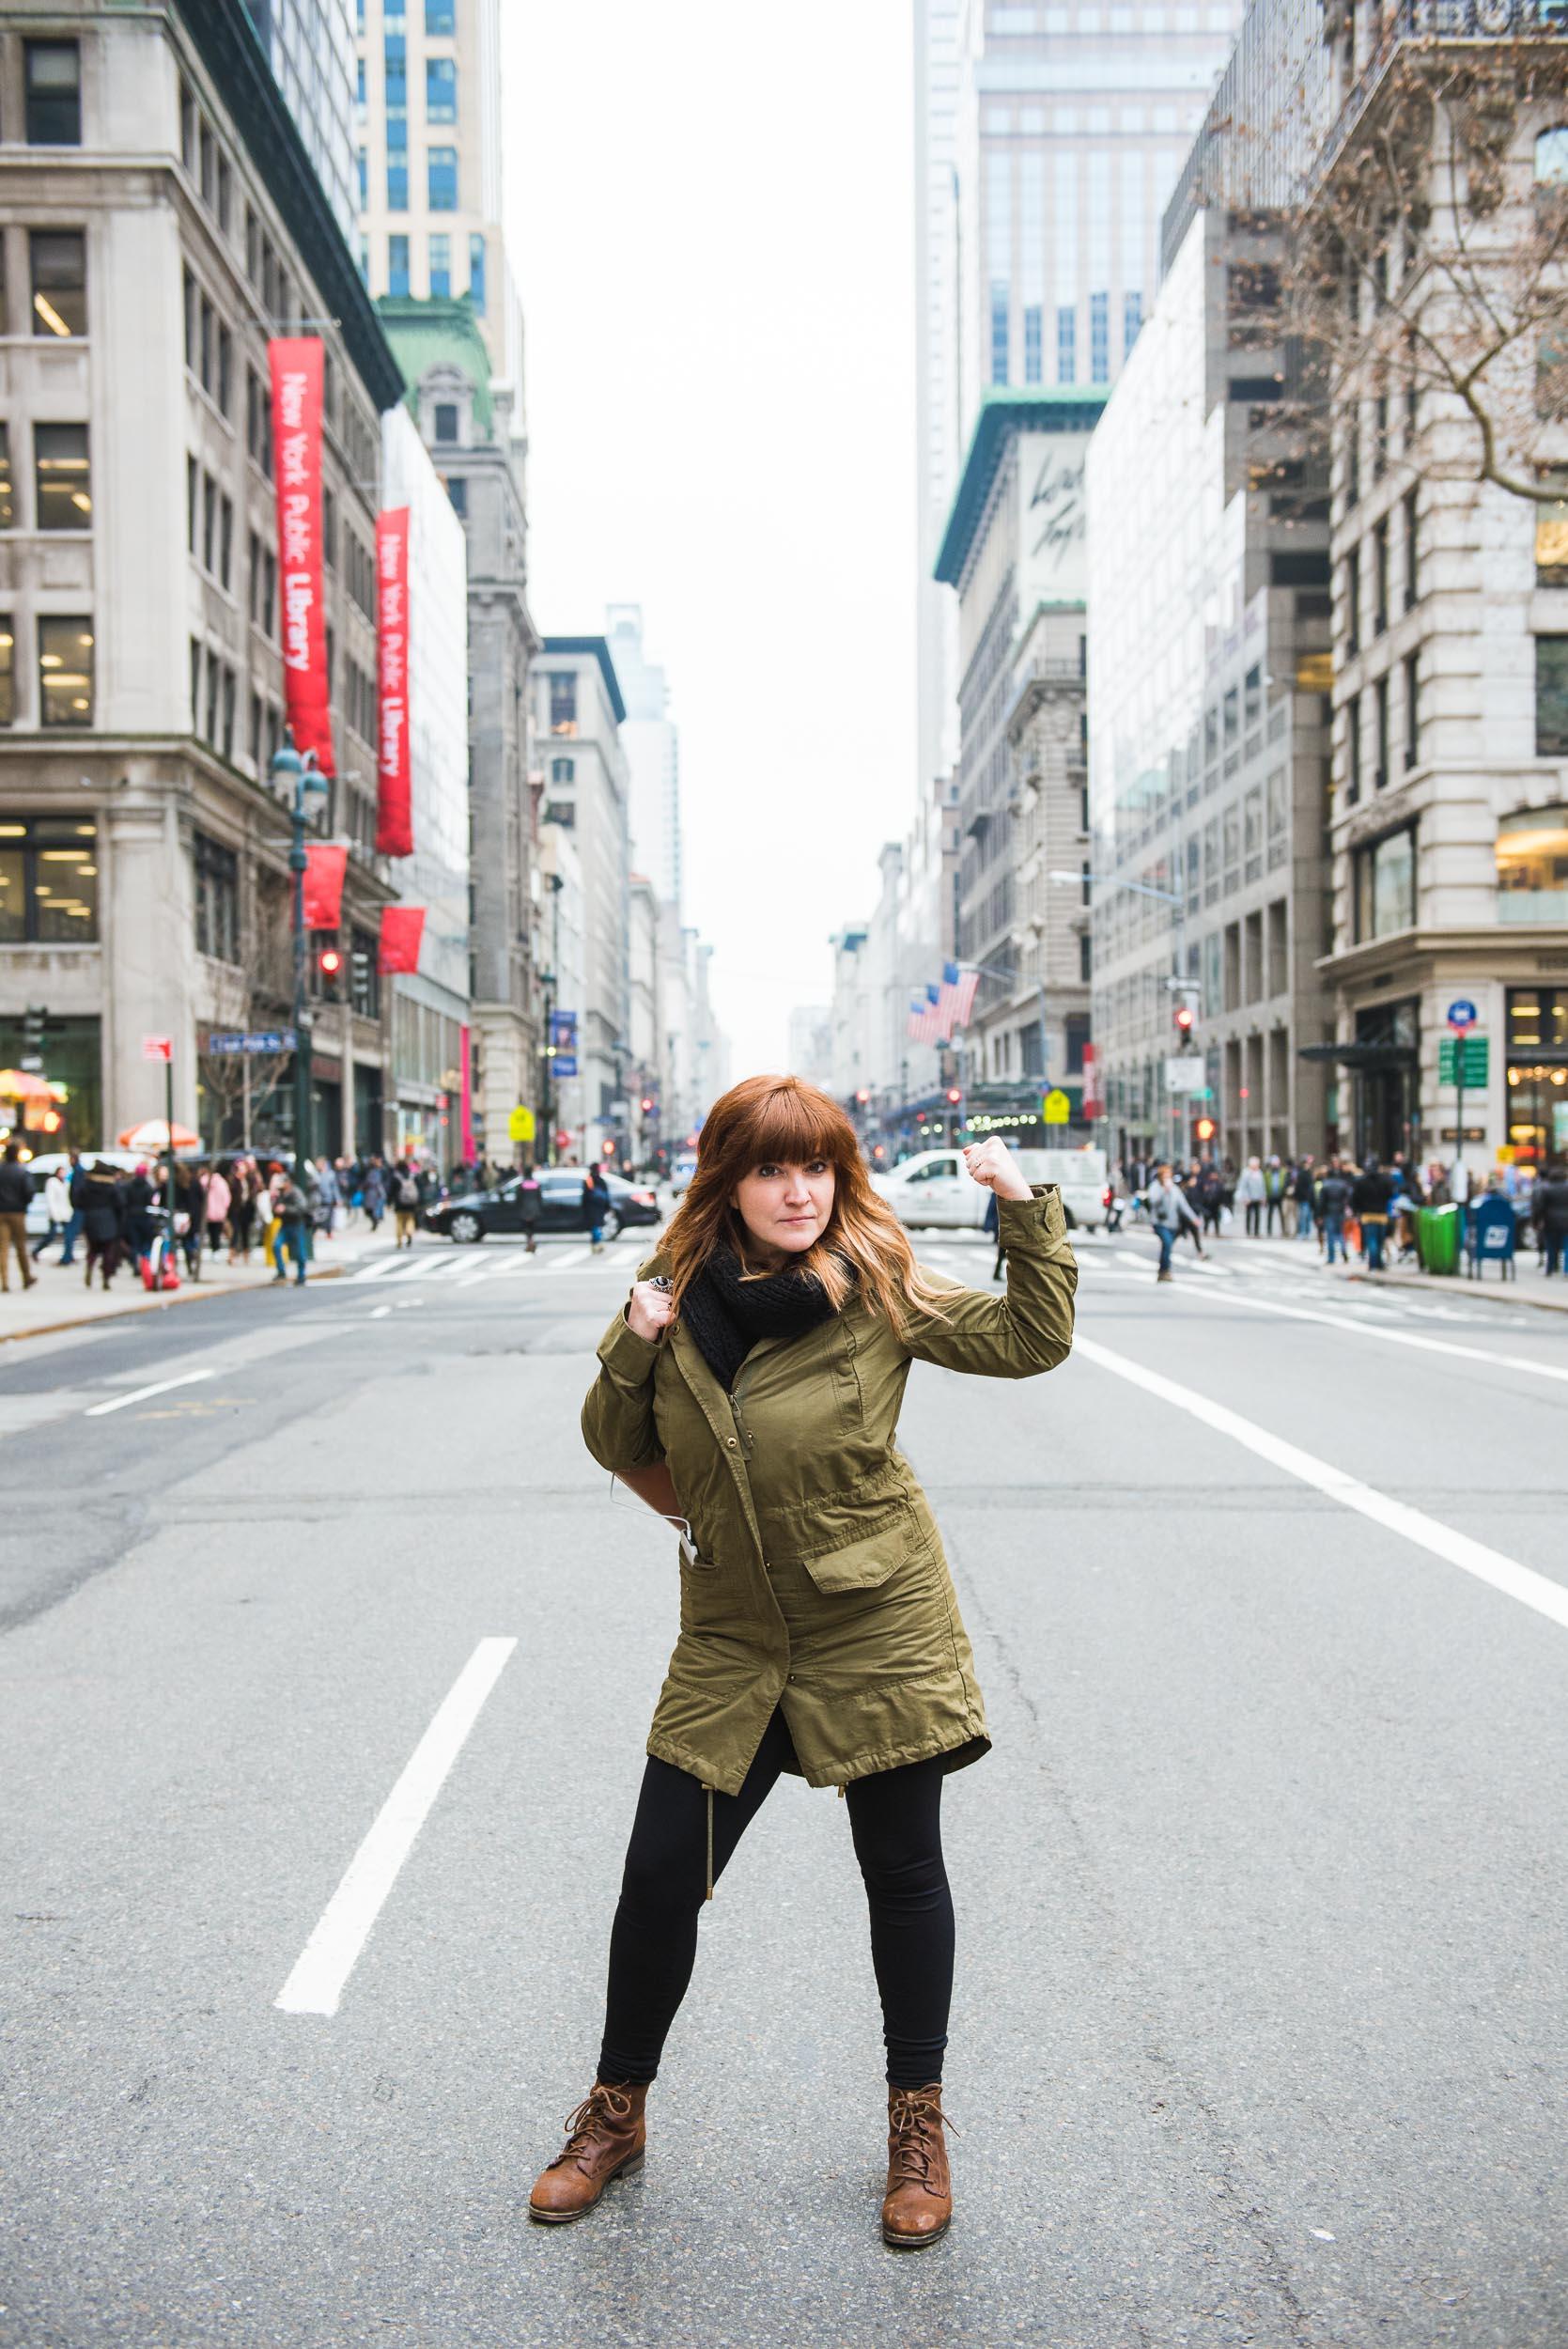 20170121 - NYC Women's March-2.jpg